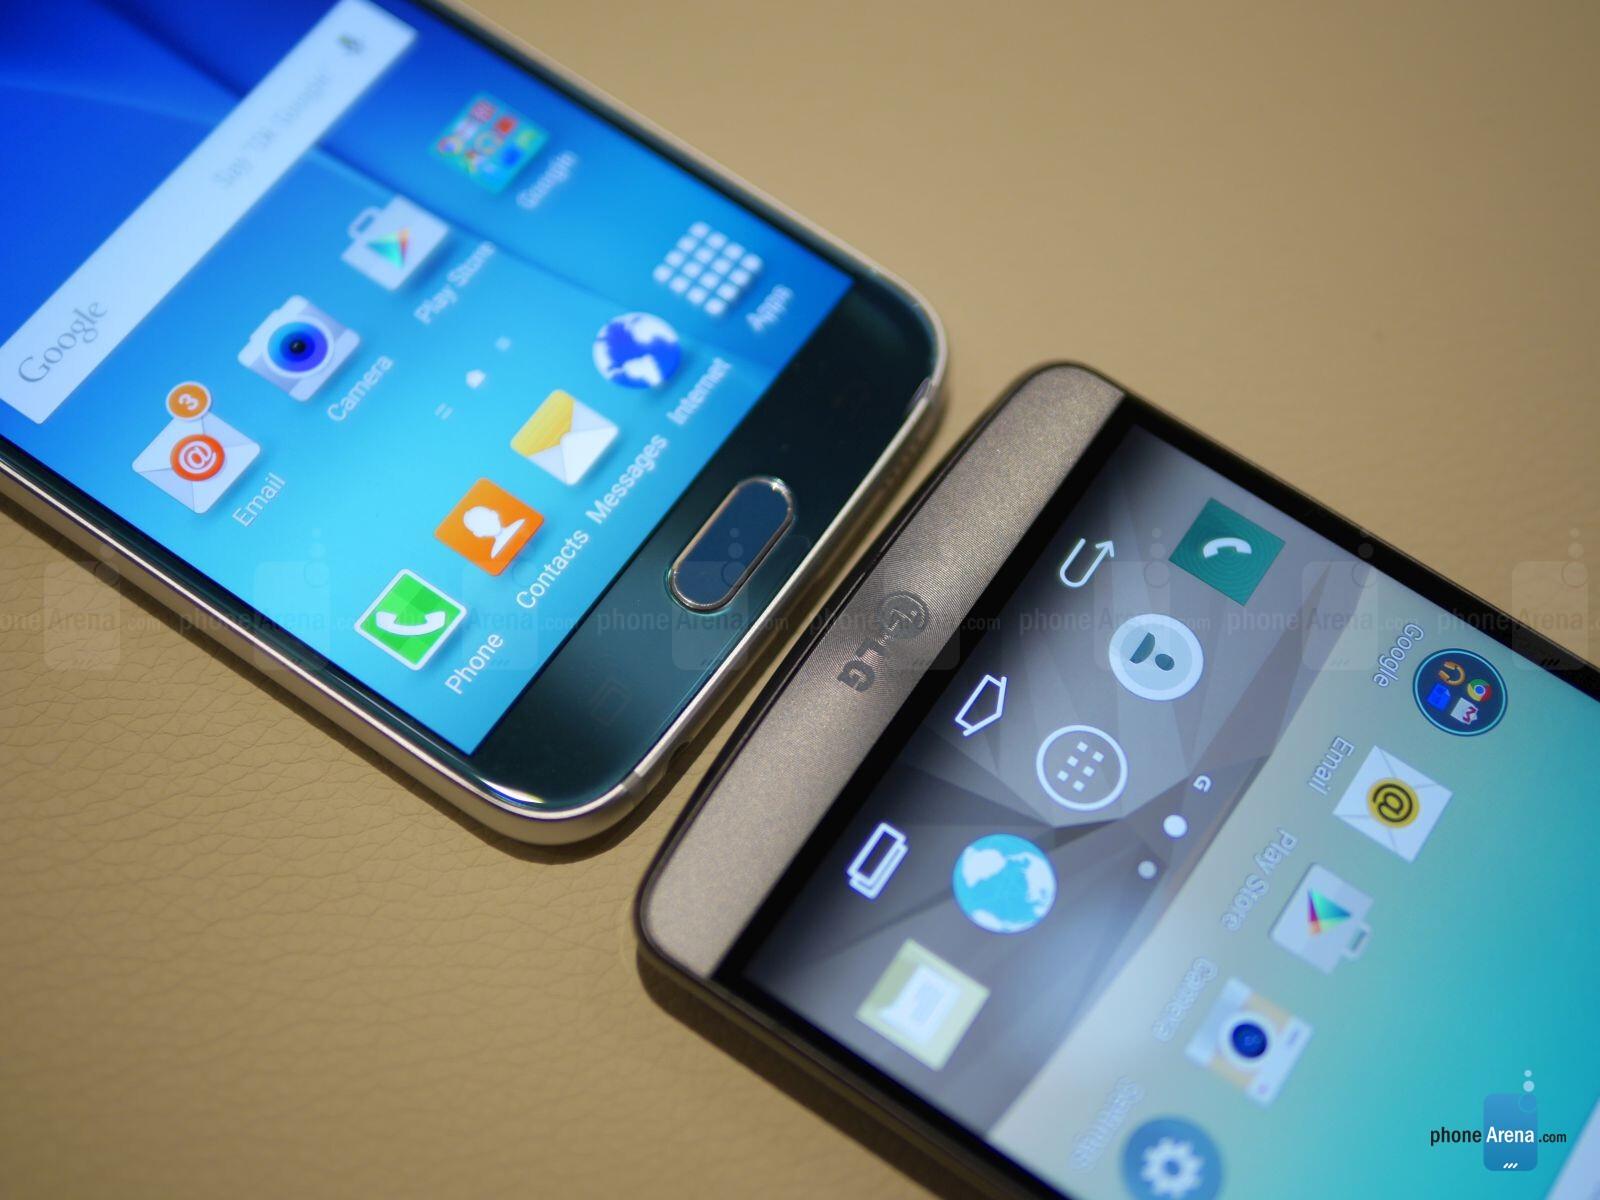 samsung galaxy s6 versus lg g3 first look phonearena reviews Droid RAZR Sony Ericsson Walkman